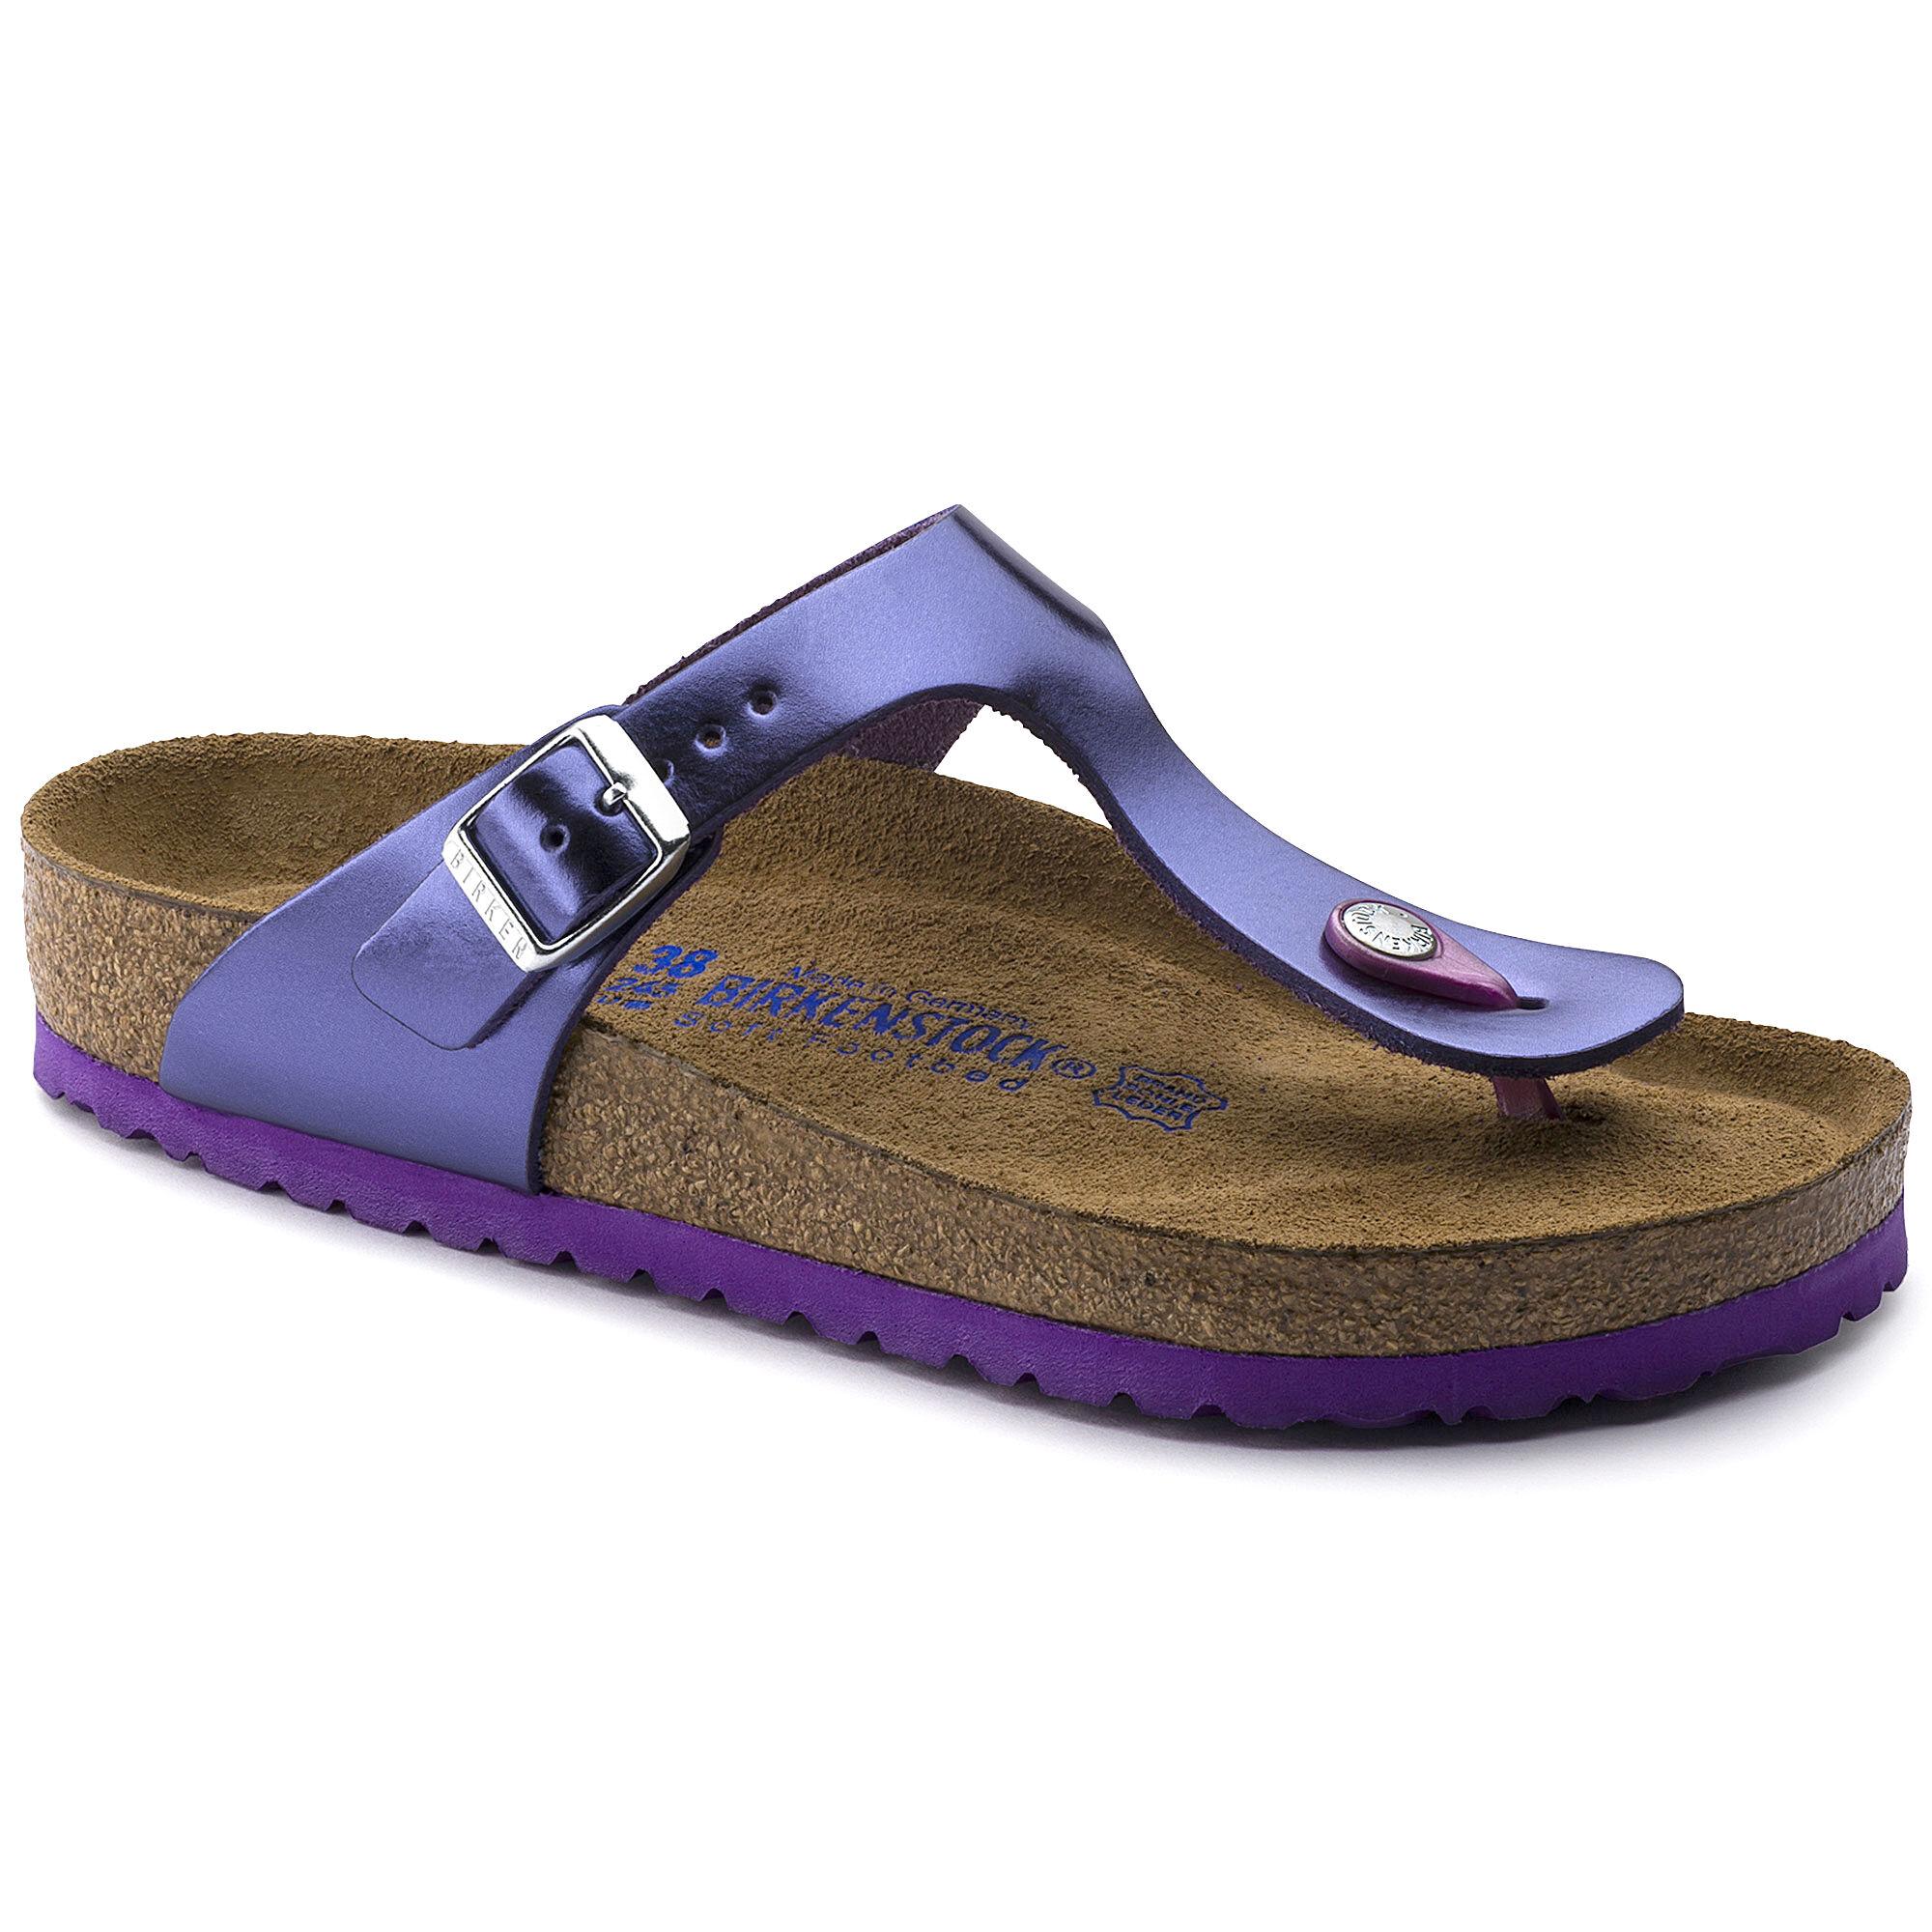 Gizeh Natural Leather Soft Footbed Metallic Violet